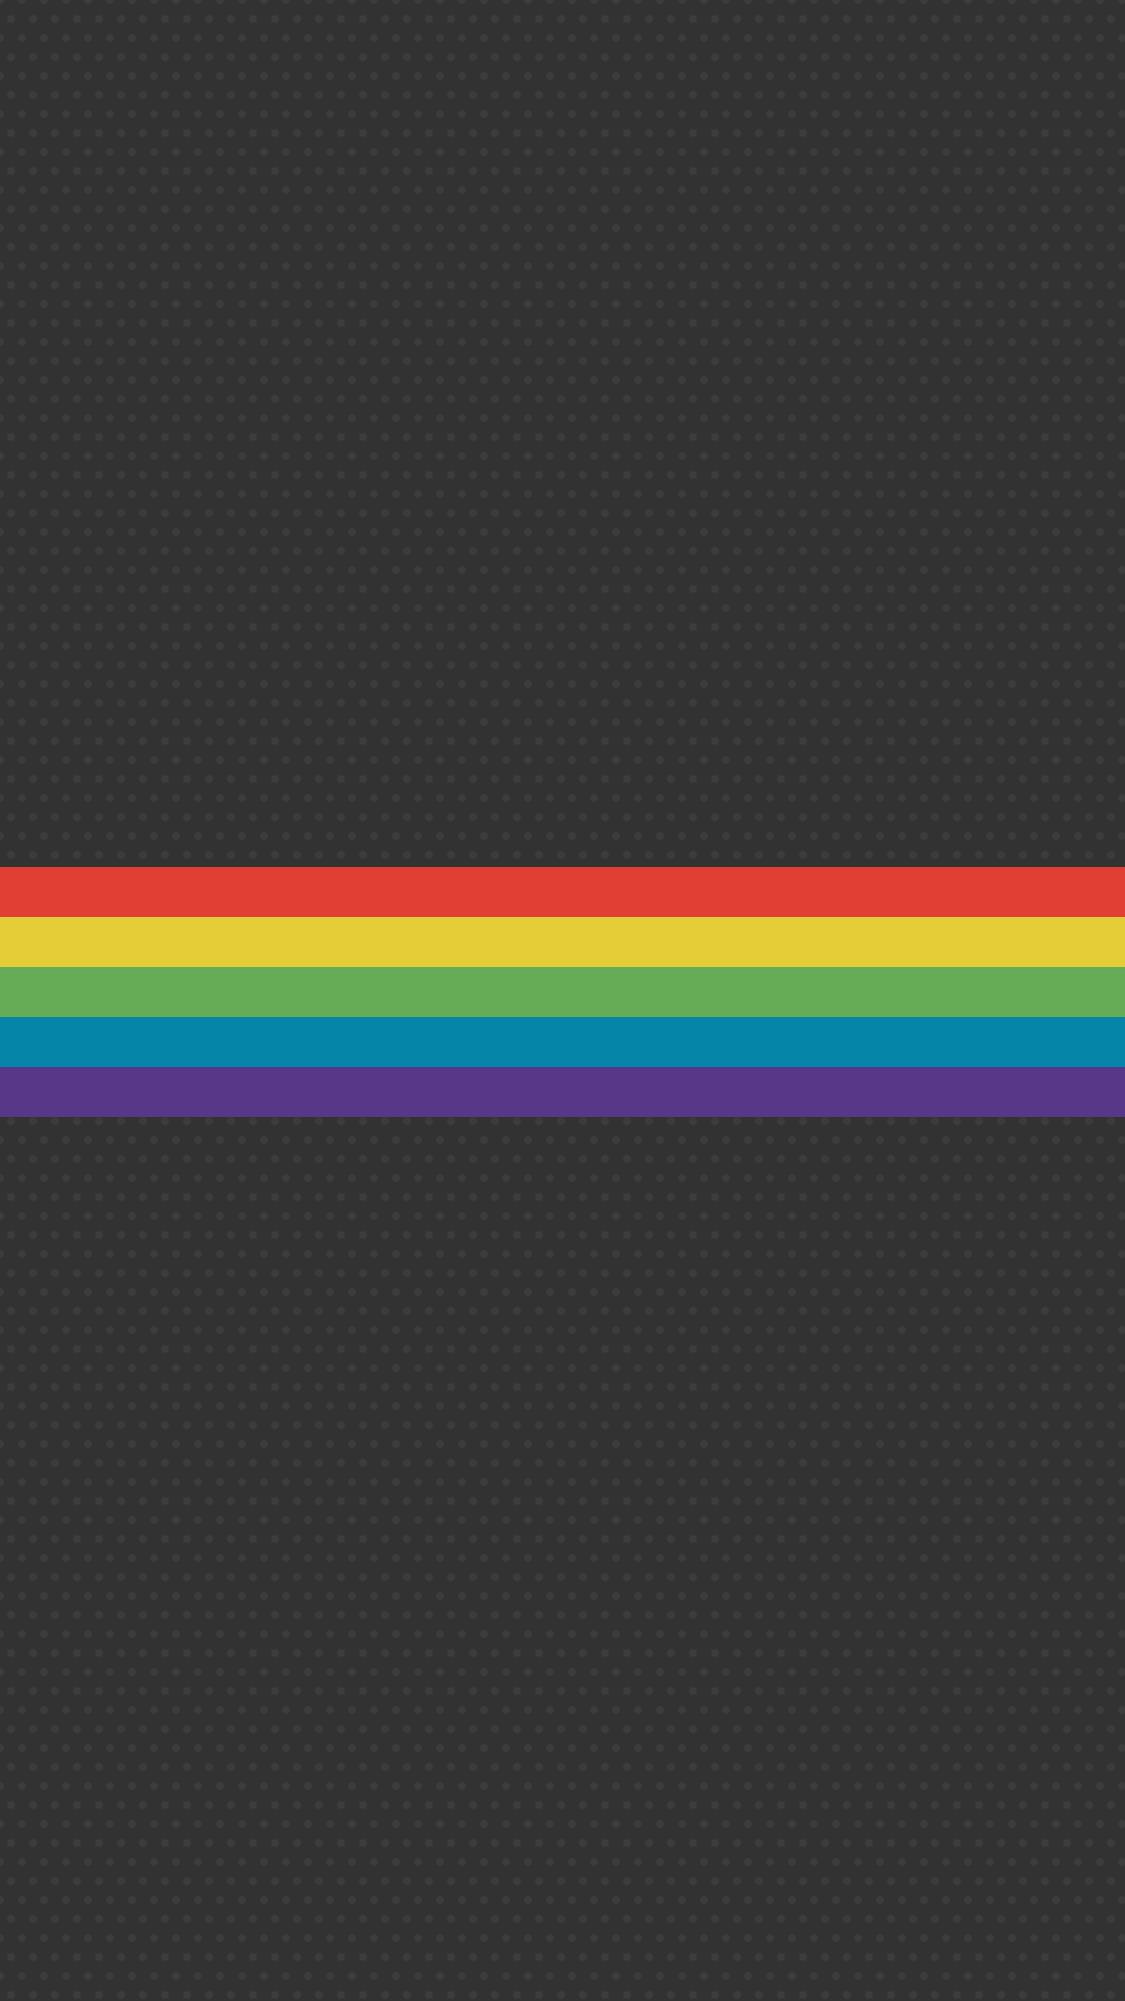 Pin By Cyn Thompson On Rainbow Wallpaper In 2019 Rainbow Wallpaper